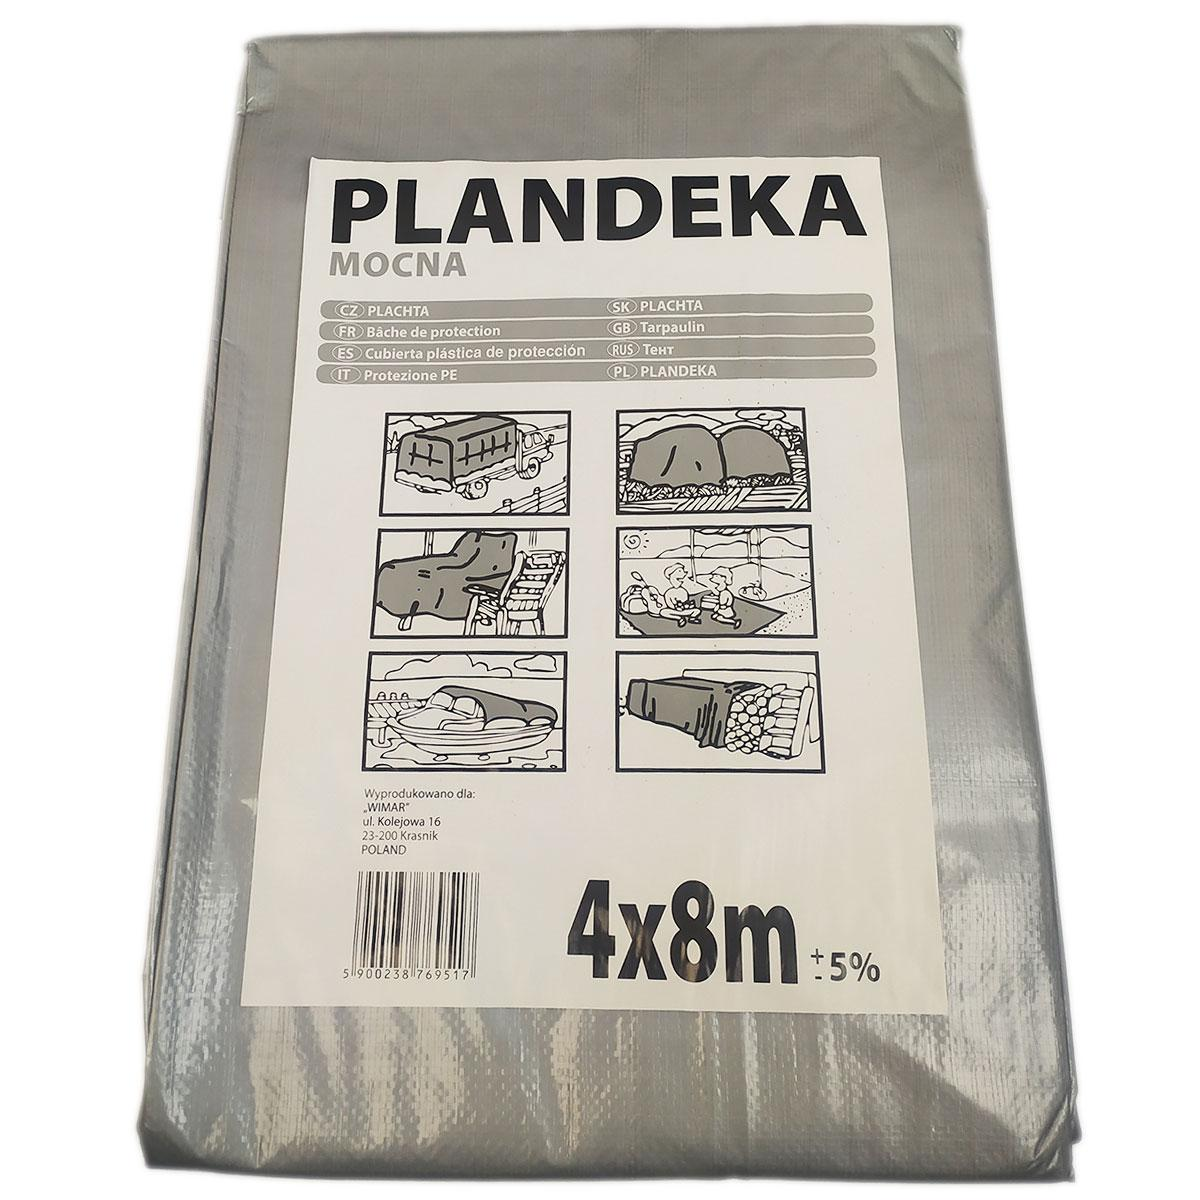 "Тент от солнца дождя и снега ""Plandeka"" 100g\m2 - 4х8м. Ламинированный с кольцами. Пологи"